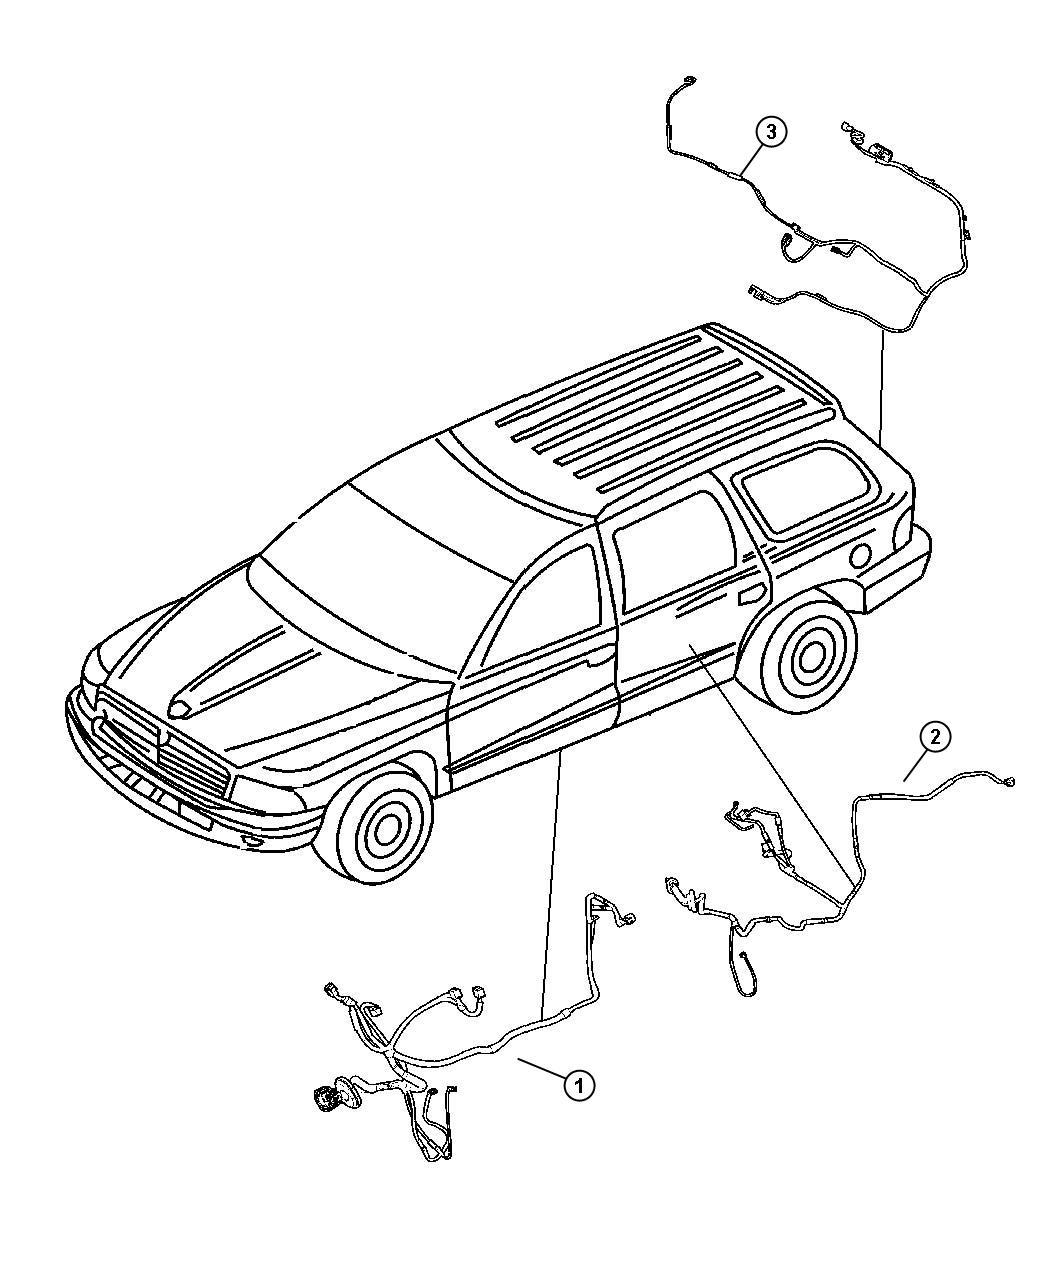 Dodge Durango Wiring  Liftgate  Rear  Parkview  Back